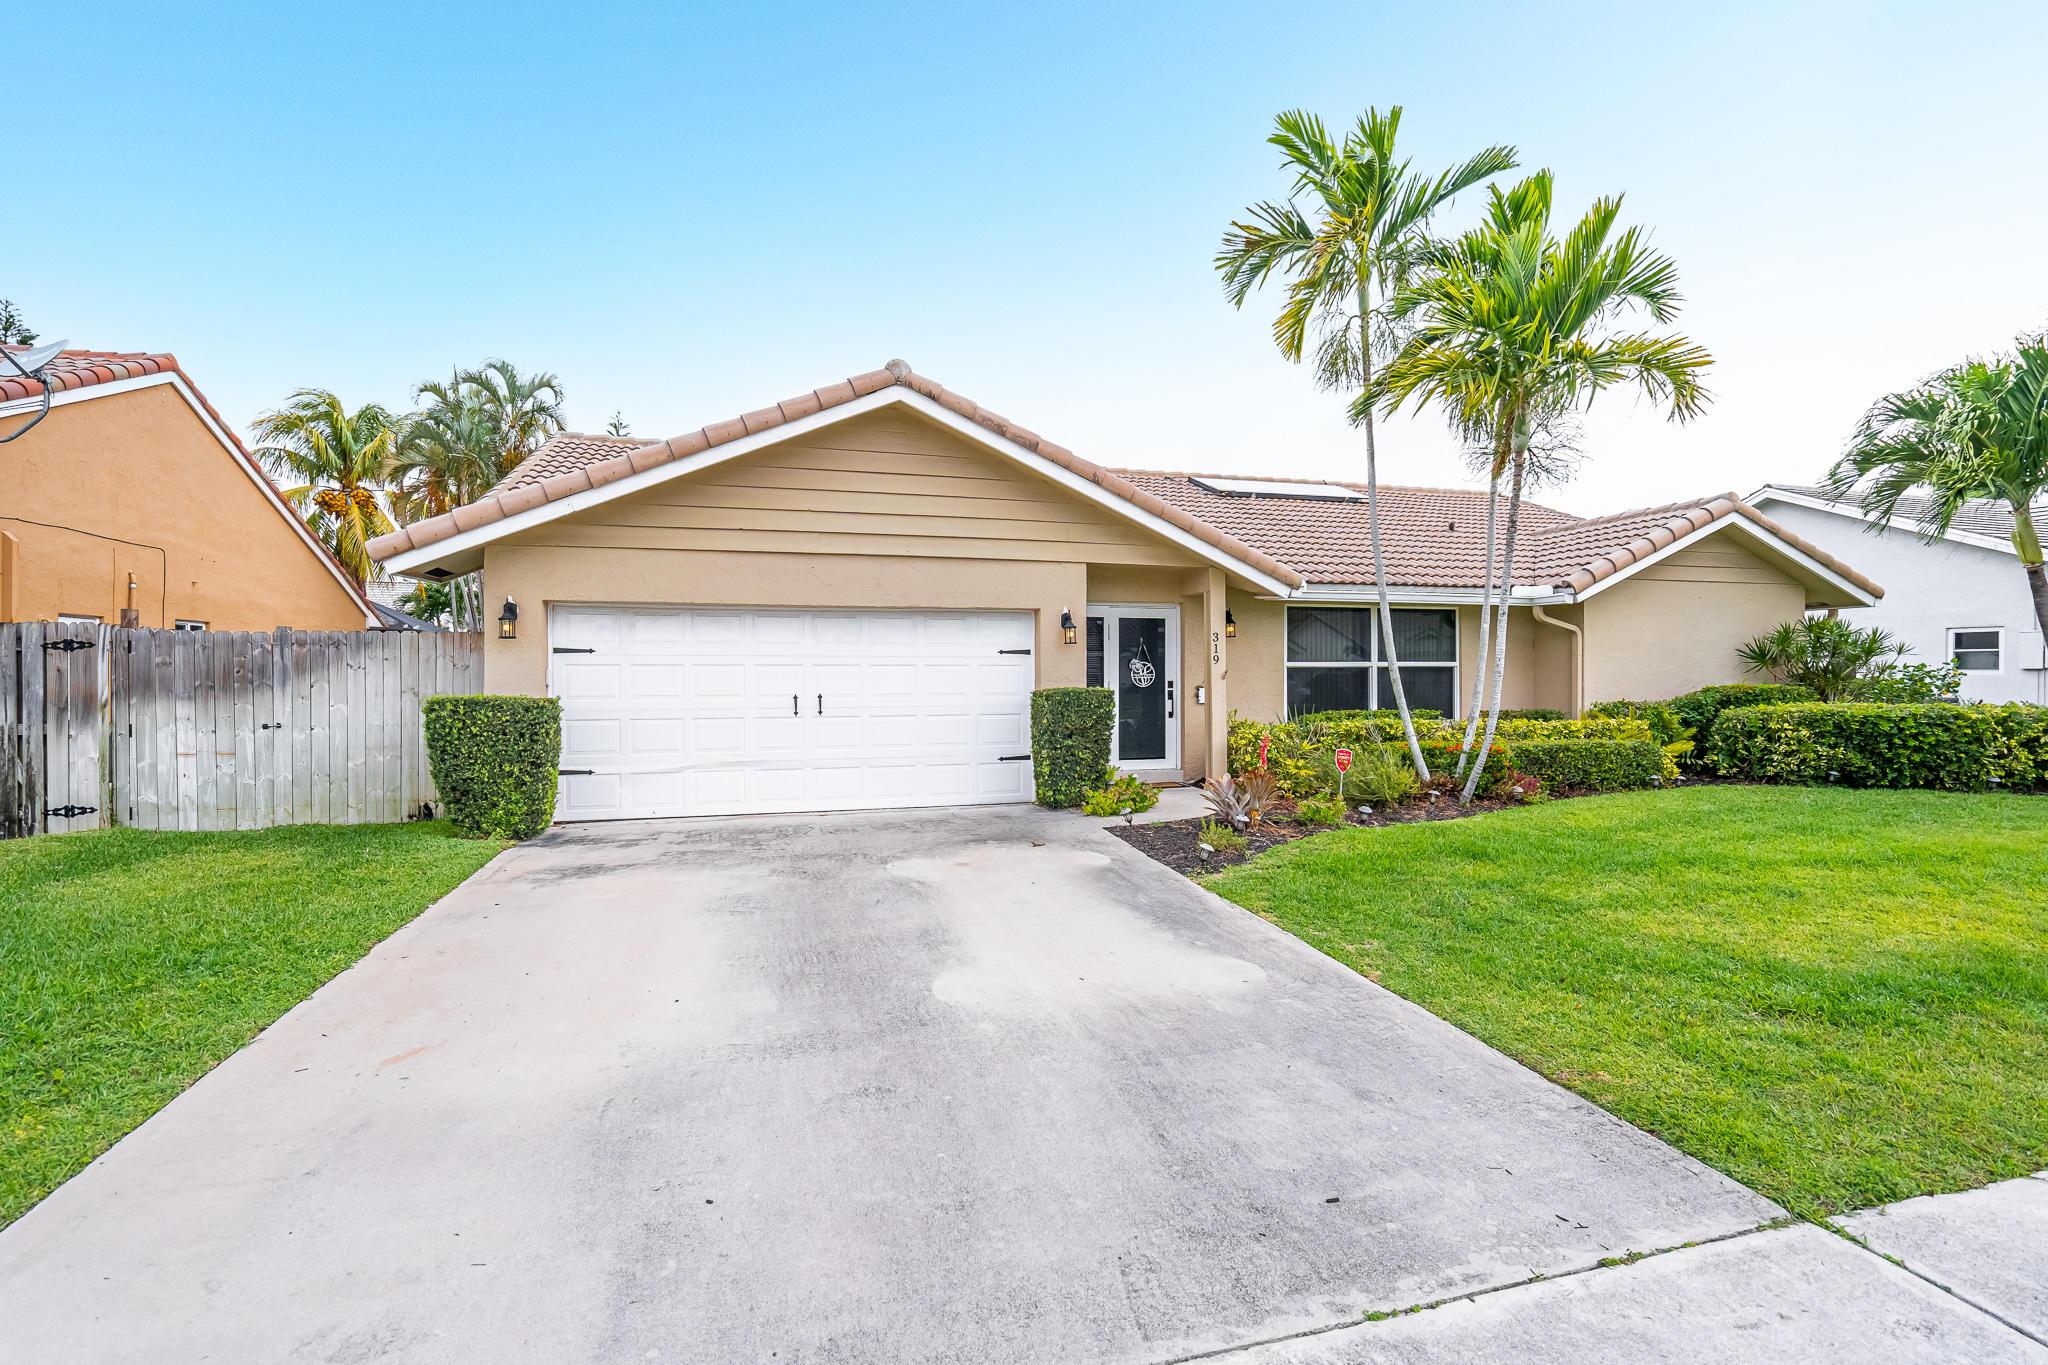 Home for sale in Hidden Valley Sec 3 Boca Raton Florida